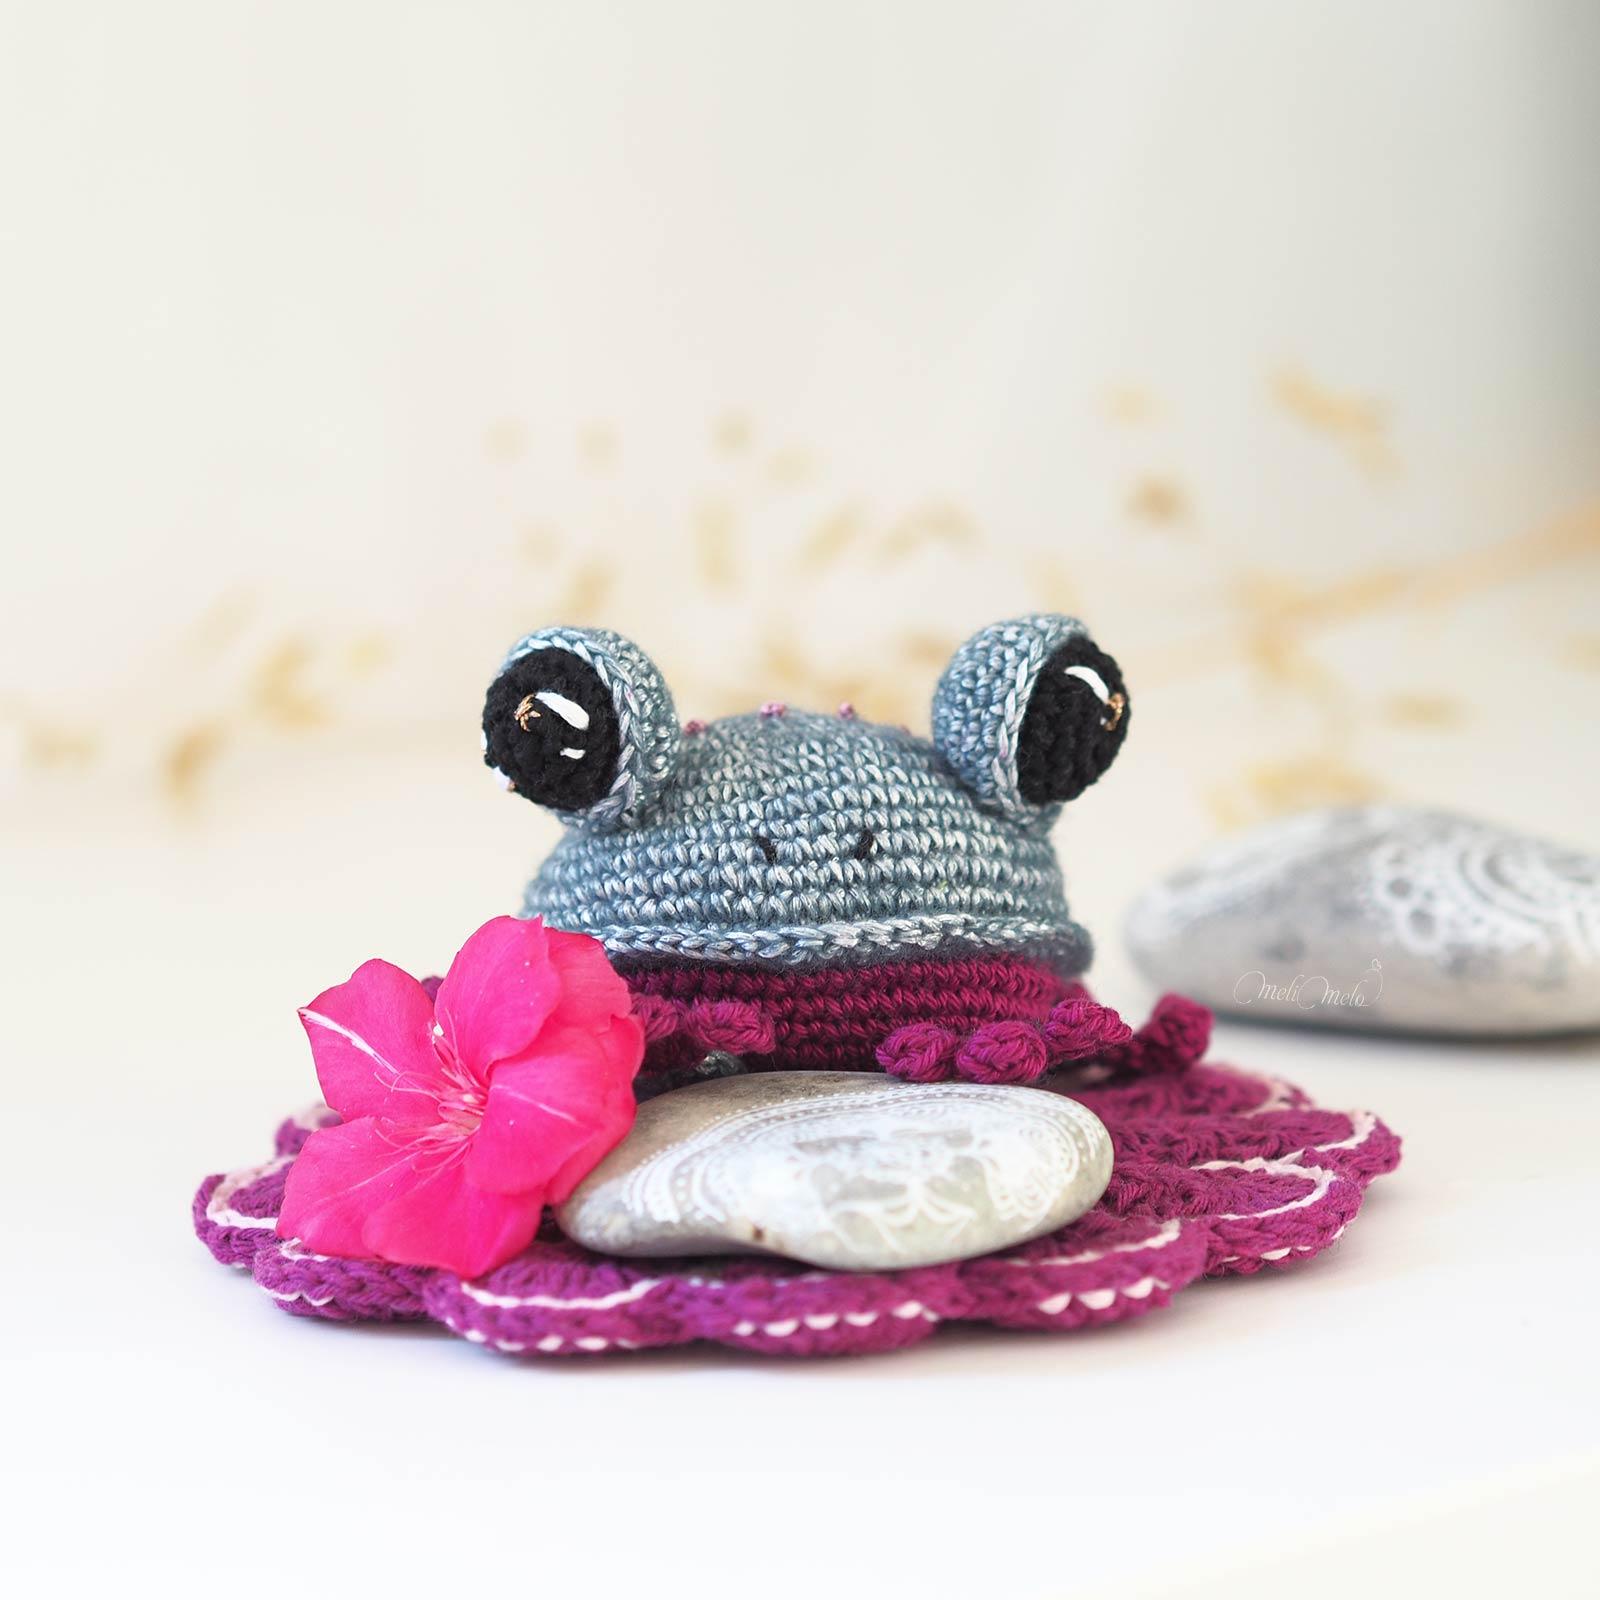 amigurumi-grenouille-bleue-blue-frog-crochet-laboutiquedemelimelo